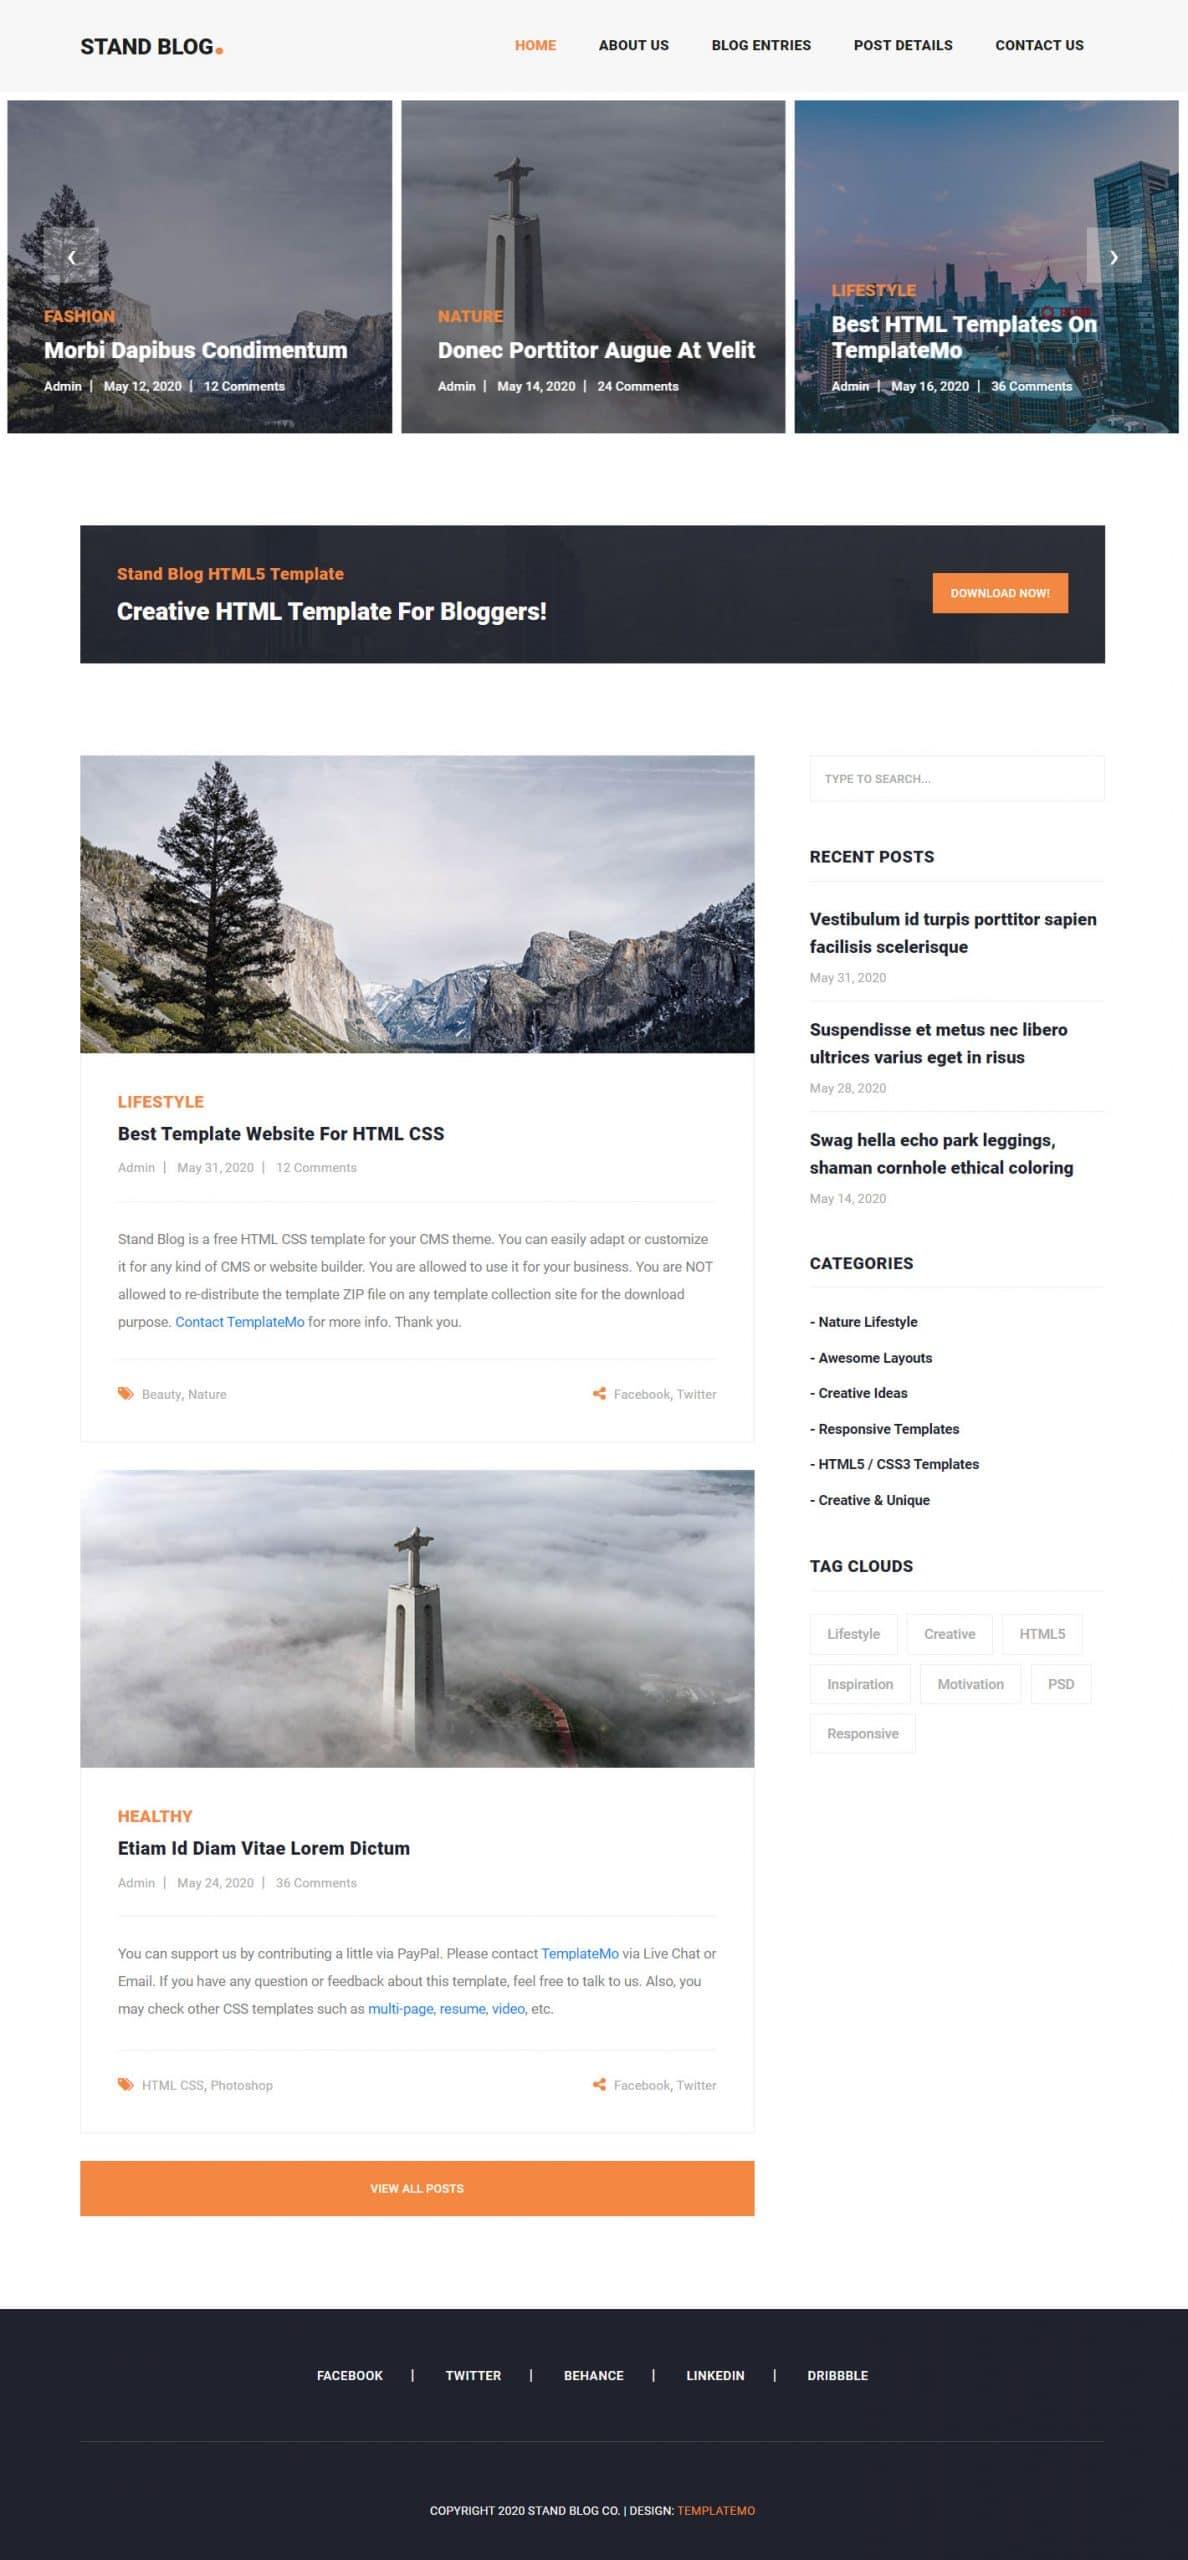 Stand Blog - Free Blog Website HTML template - DesignHooks